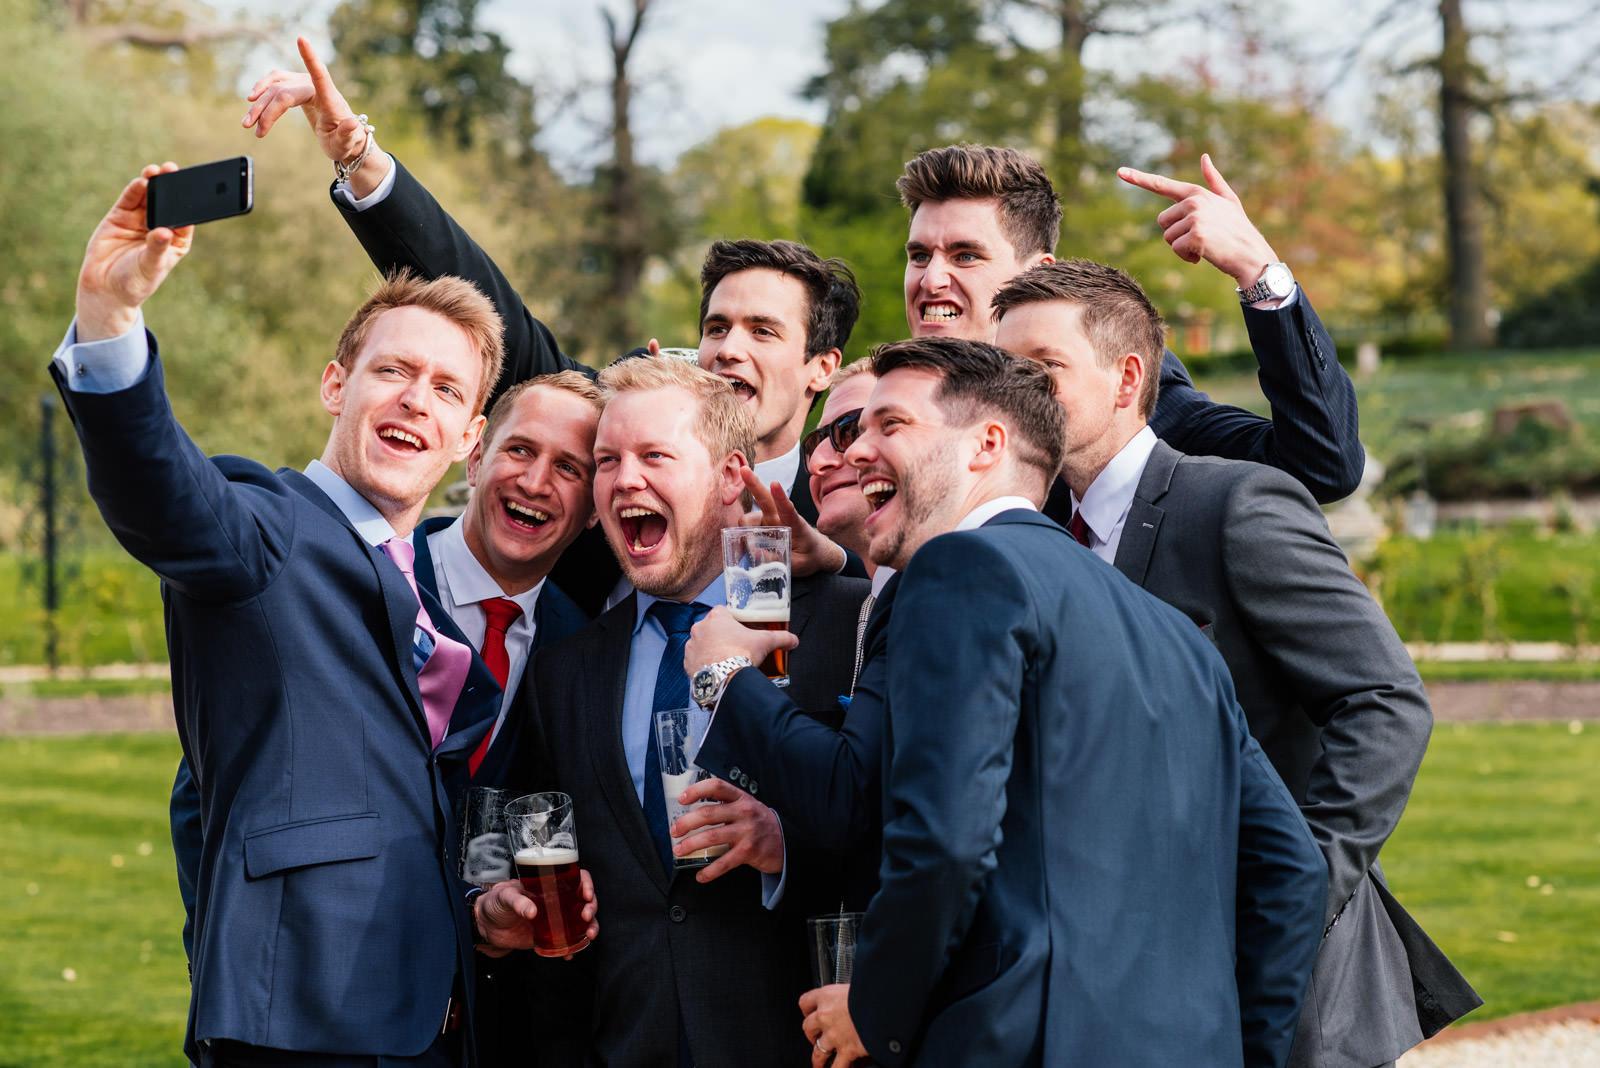 Wedding Guest Selfies